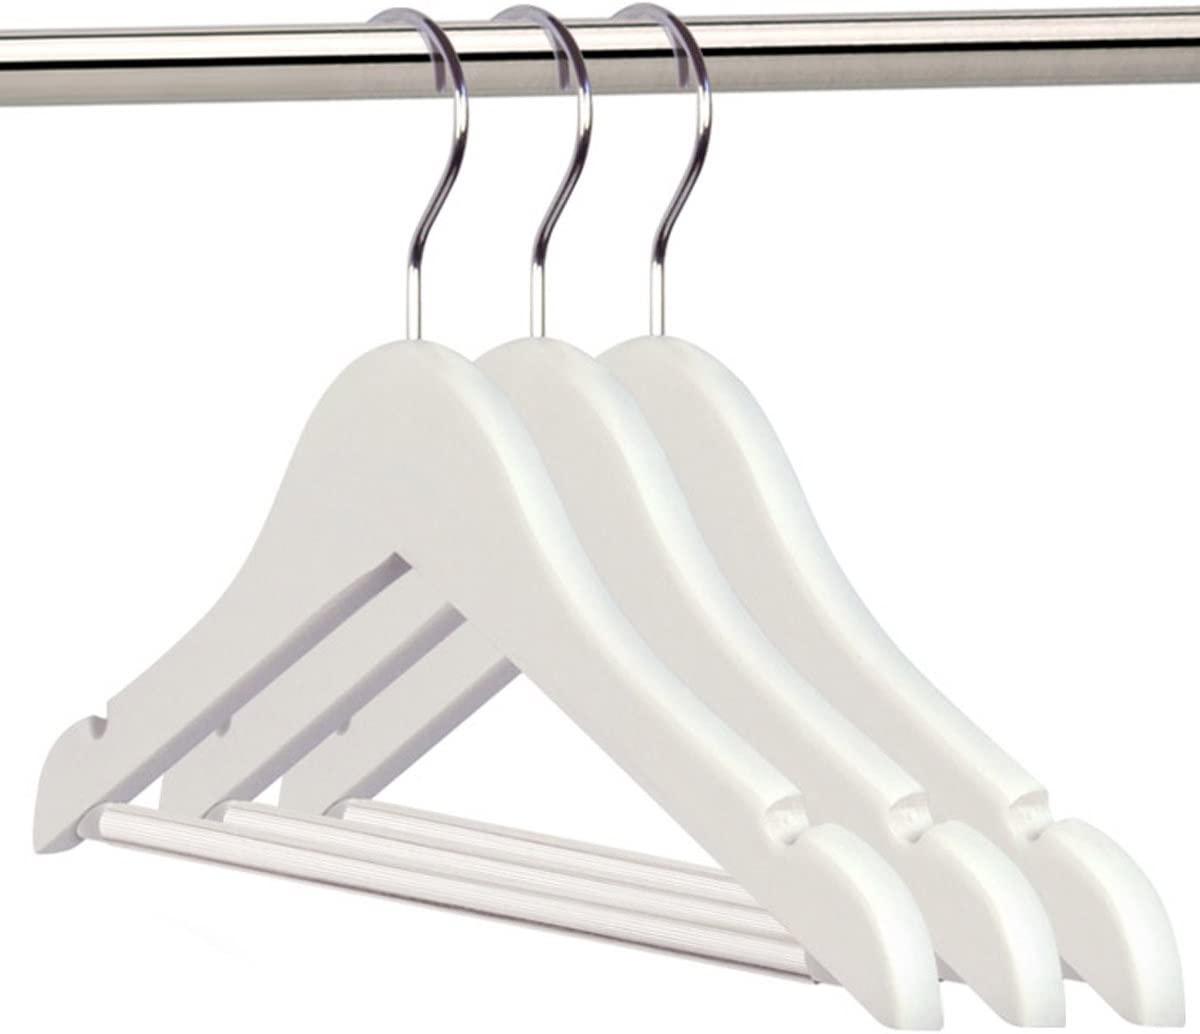 HANGERWORLD 36 Childrens 30cm White Wooden Baby Toddler Clothes Coat Hangers with Non Slip Trouser Bar